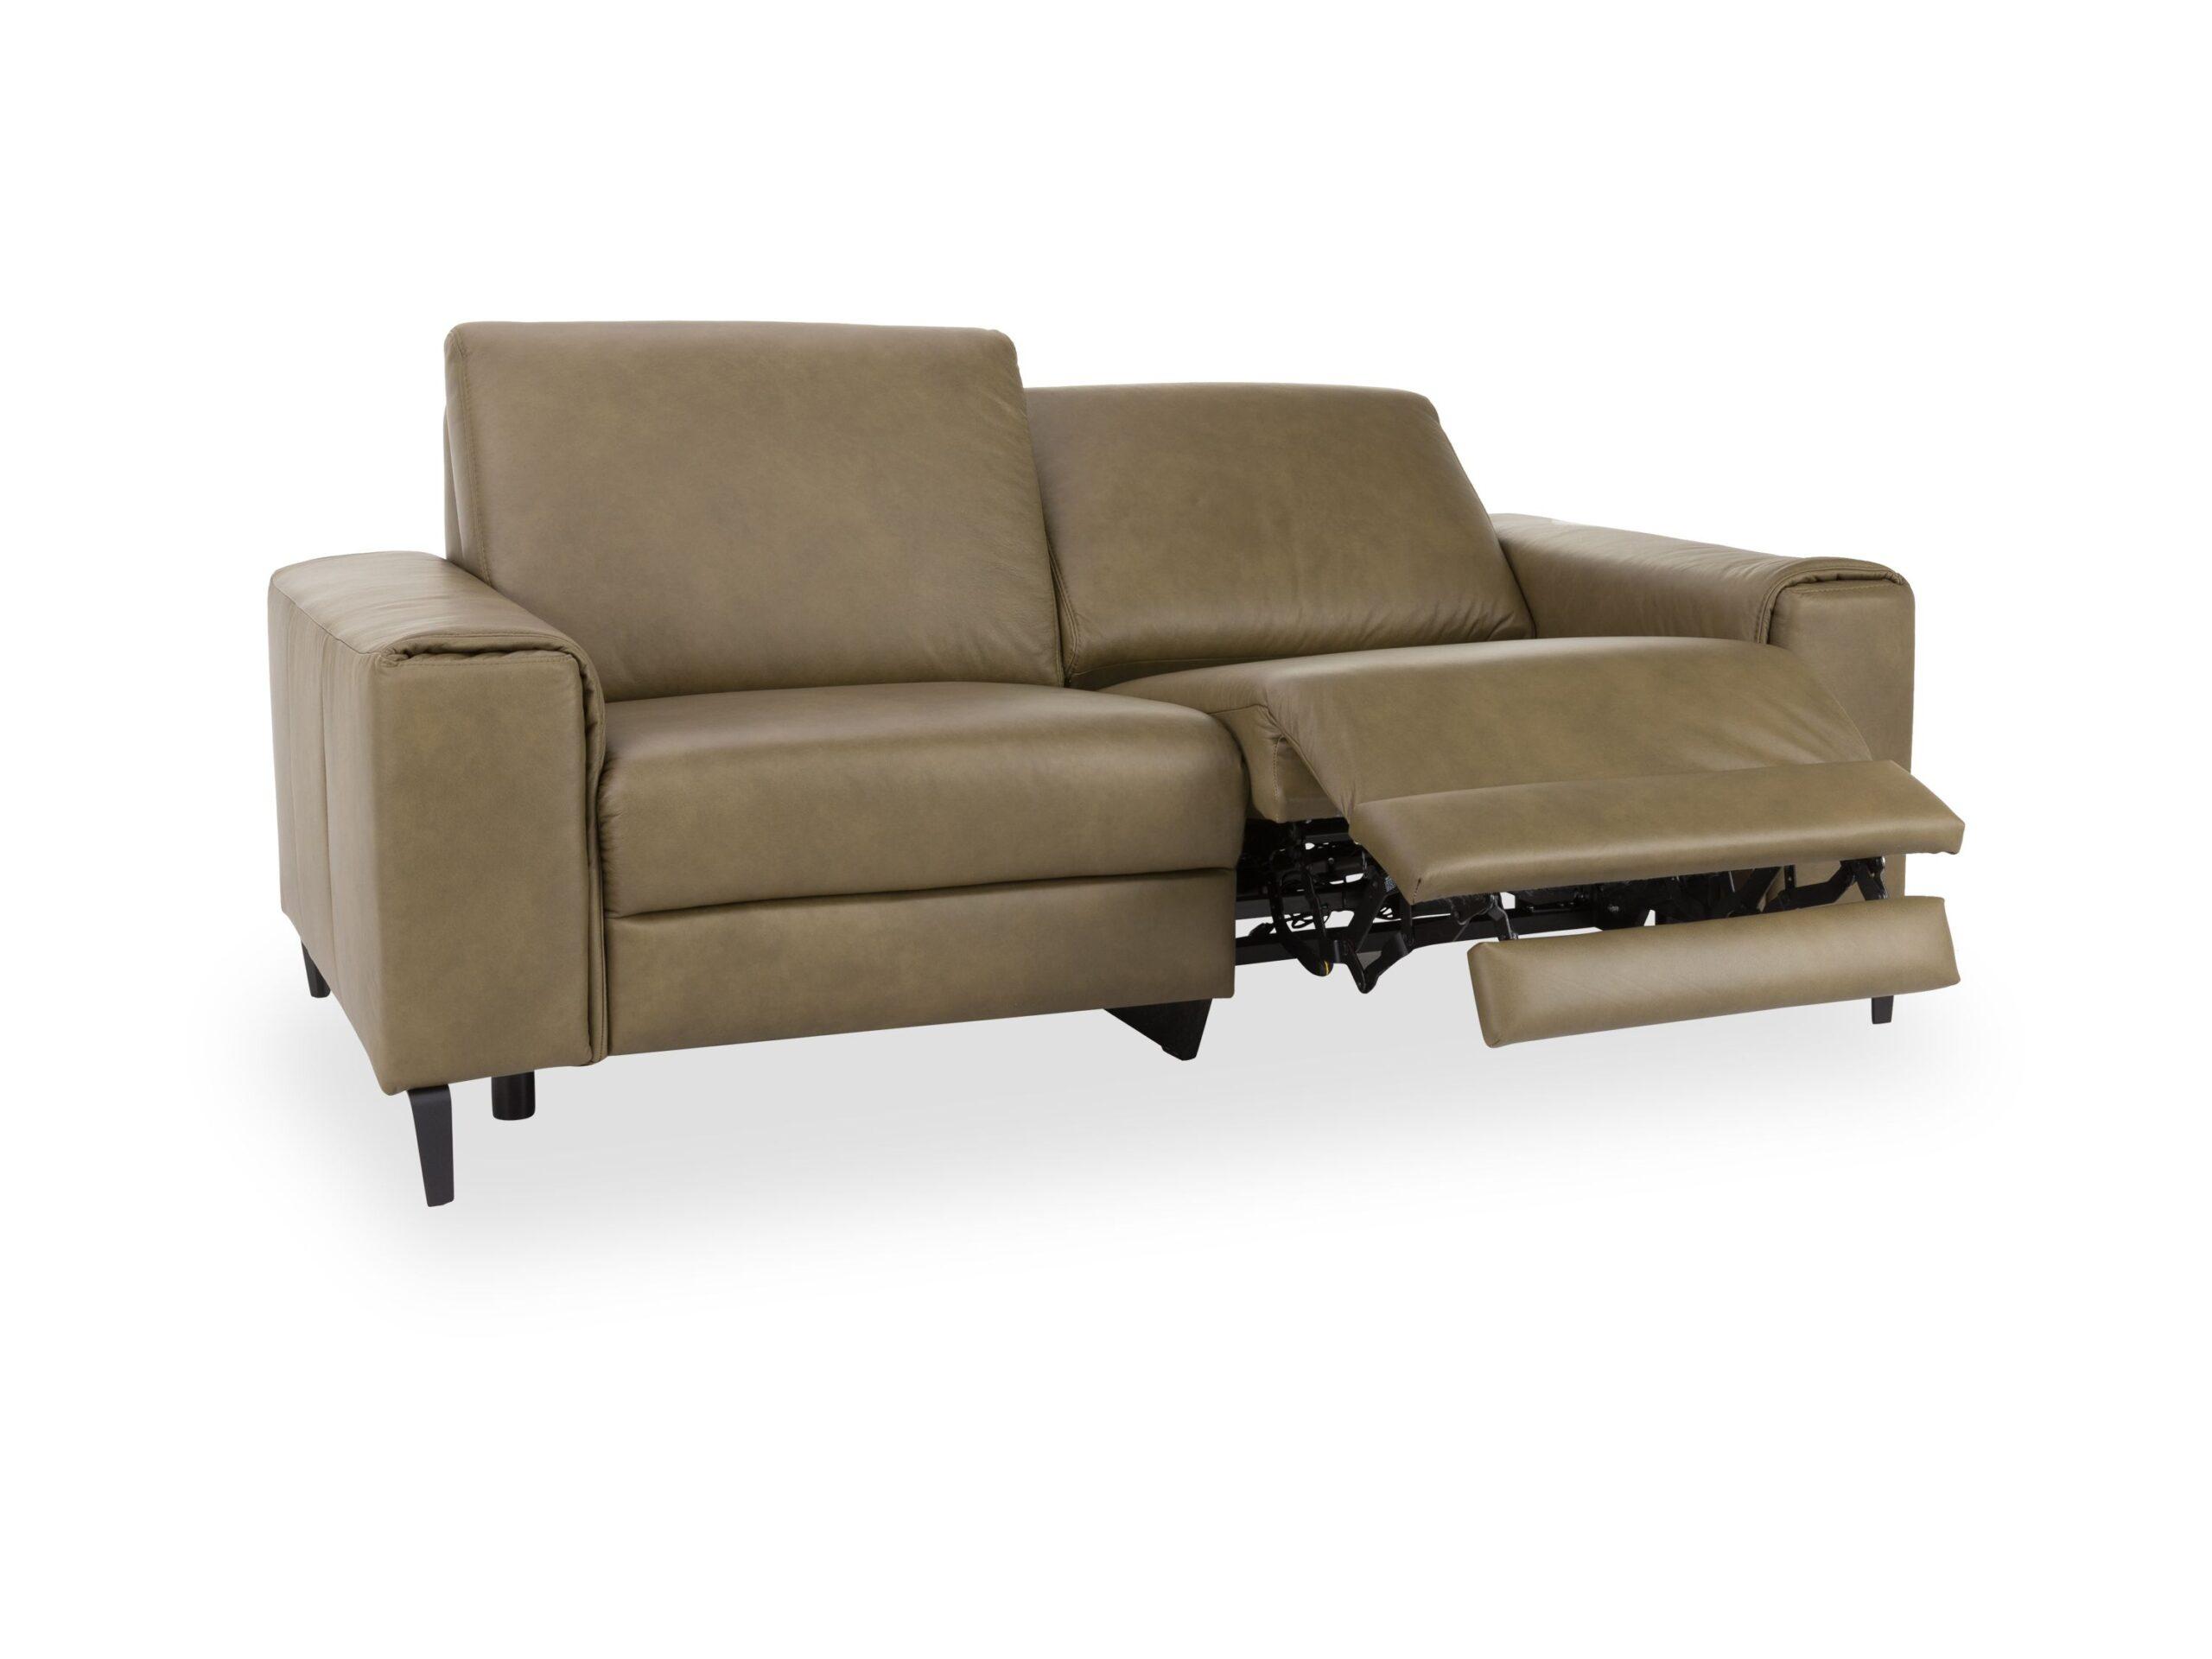 Full Size of Mondo Sofa Bertinoro Orari Srl Capocolle Couch Kaufen 2 Agata Meble Softline Bed Online 3 Tlg Marica Ledersofas Polstermbel Mbel Mit Bettkasten Delife Hussen Sofa Mondo Sofa